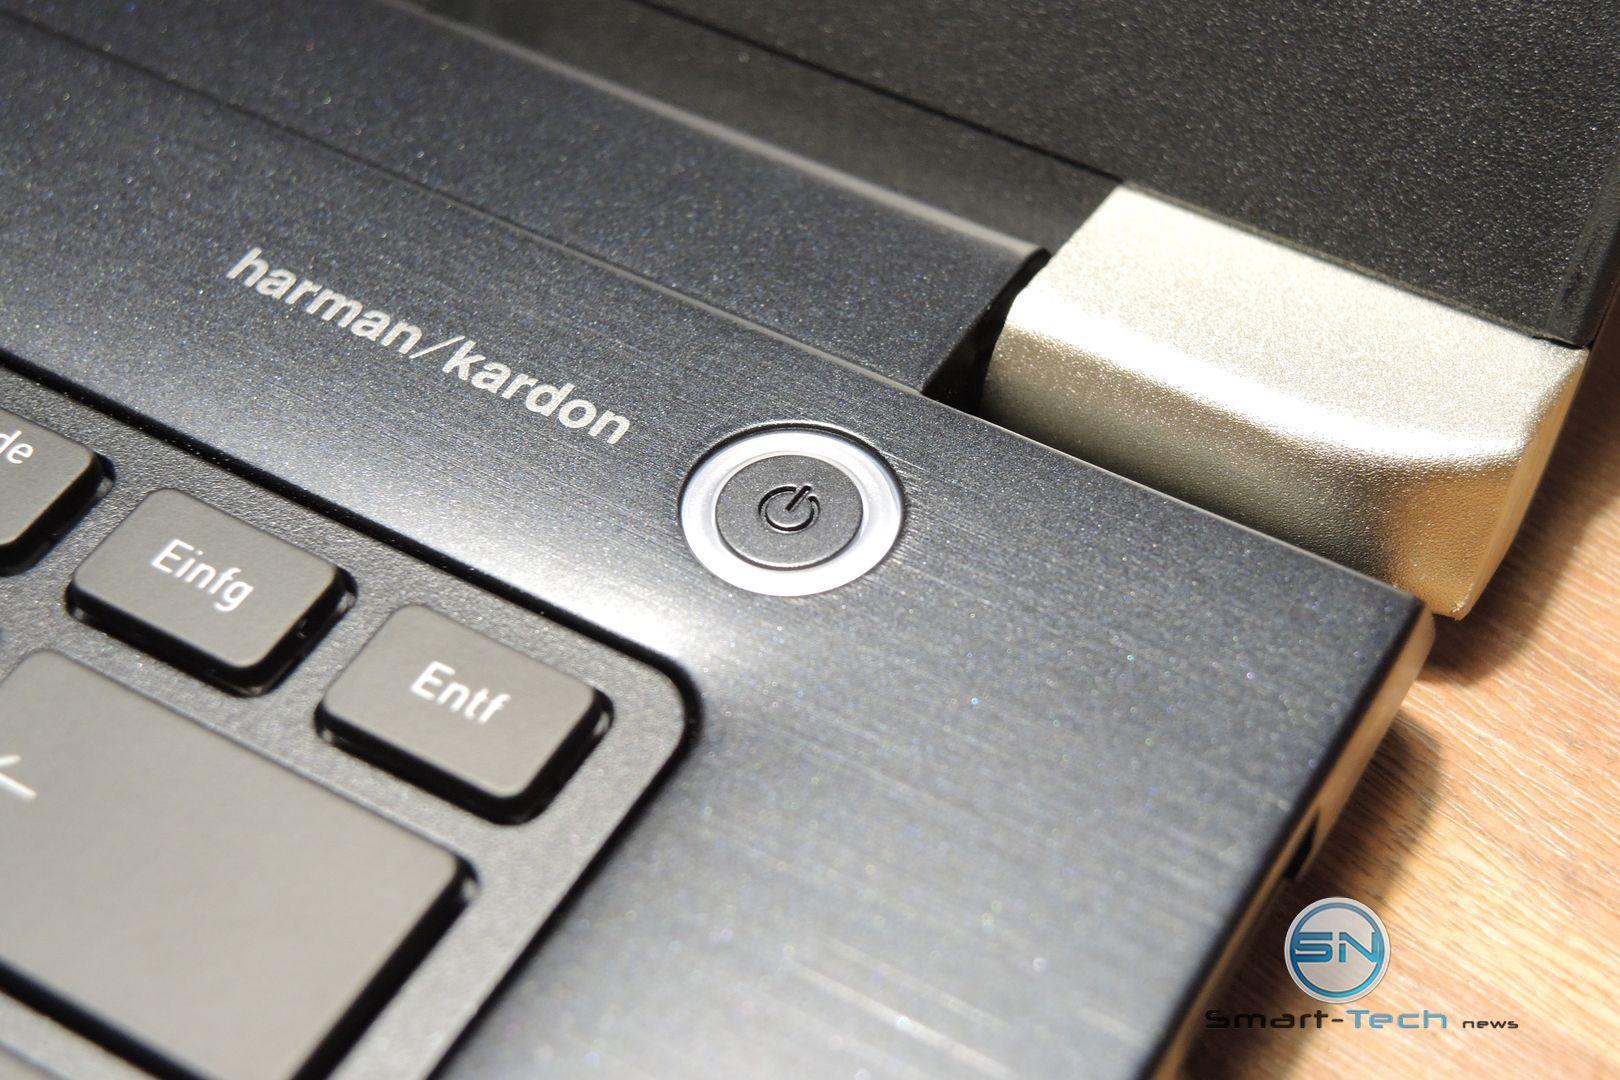 Toshiba Tecra X40-D-10R – Ultrabook